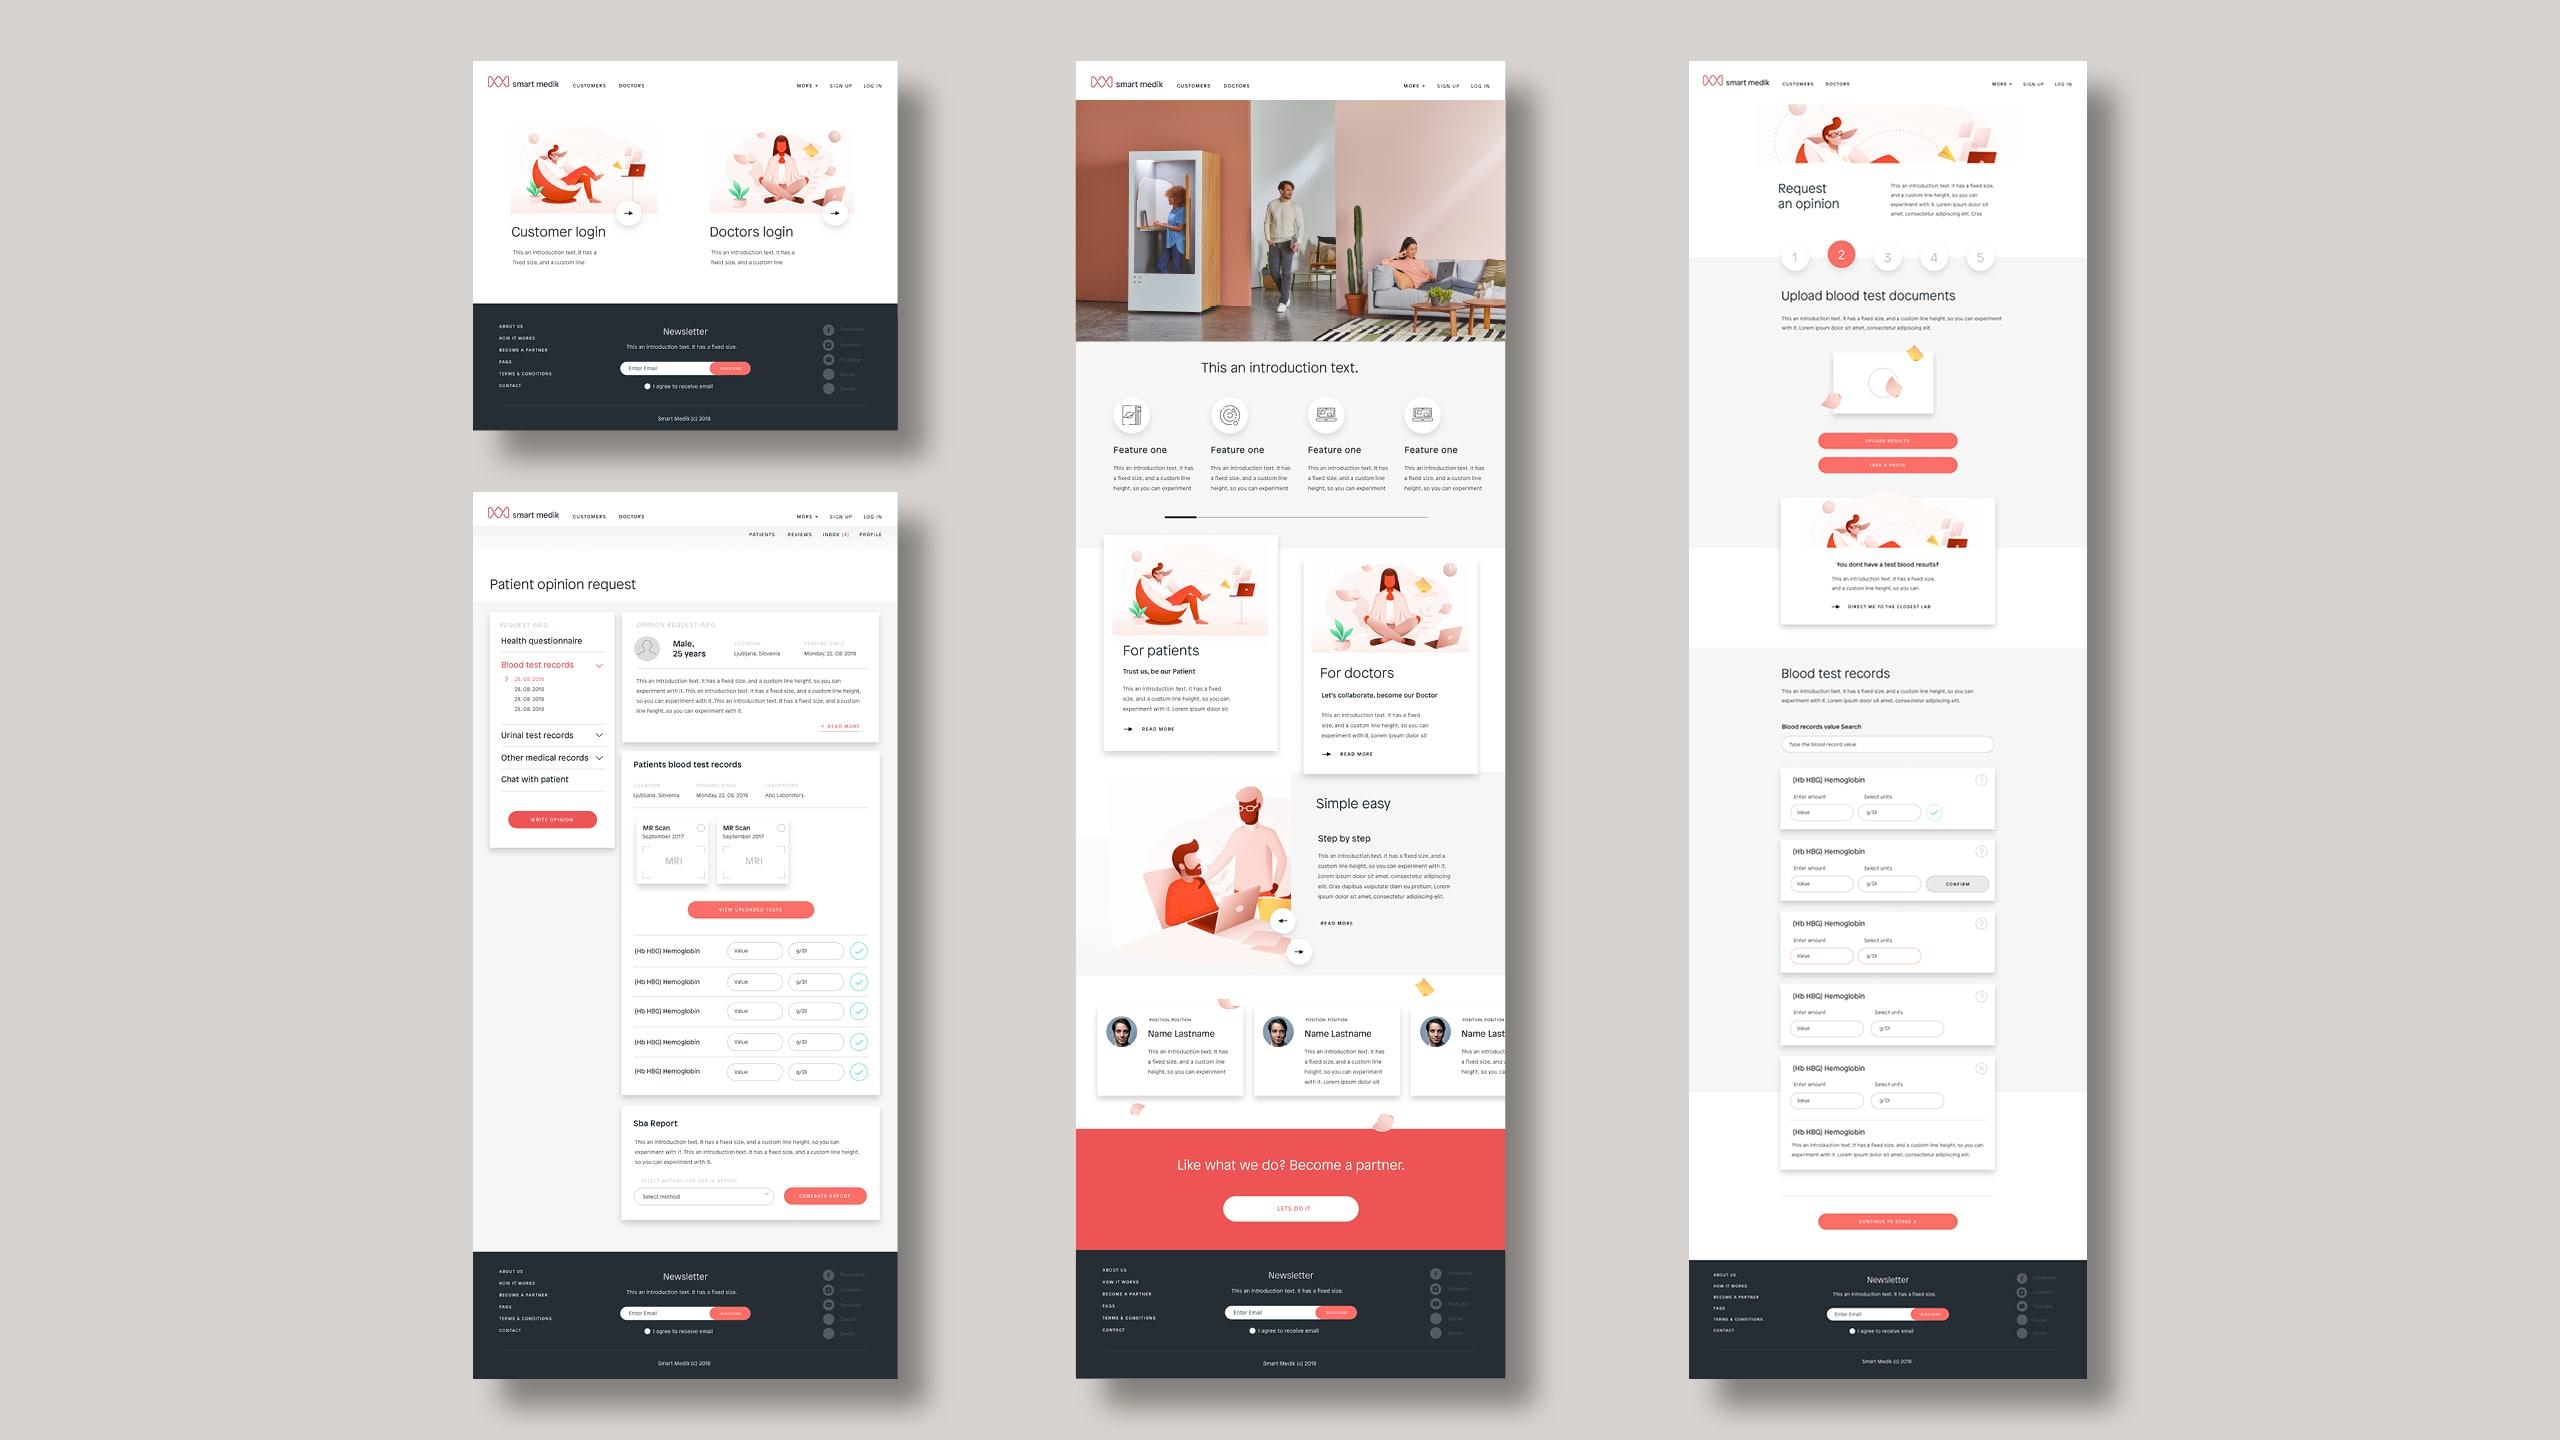 mantik-digital-branding-development-agency-creative-app-ui-web-branding-216-min